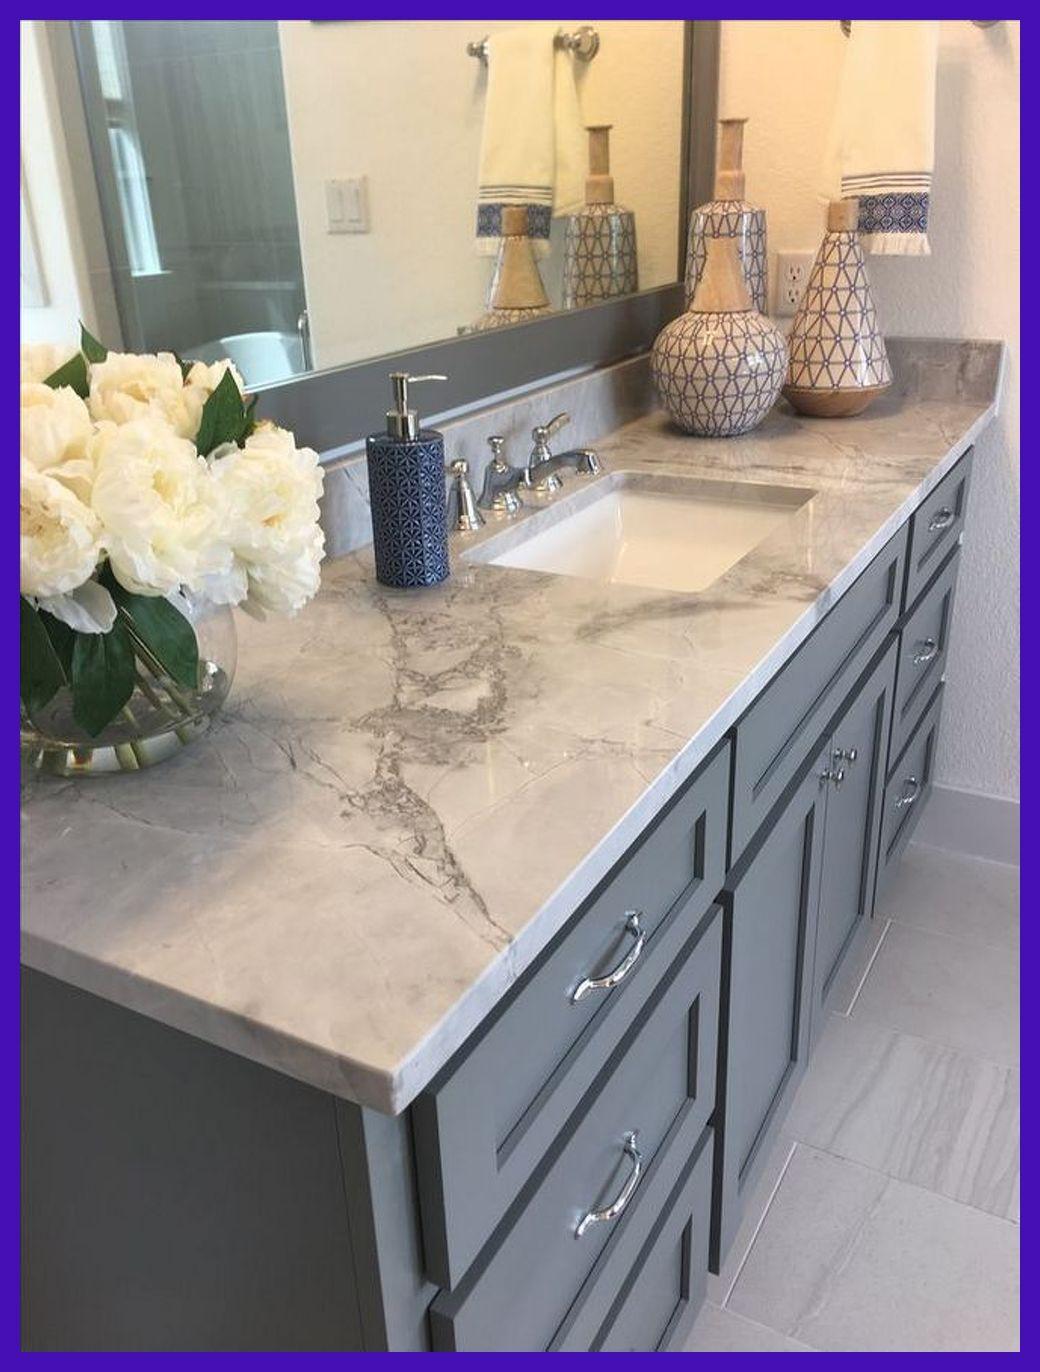 Need Some Ideas For Your Kitchen Decor Kitchen Decor Kitchen